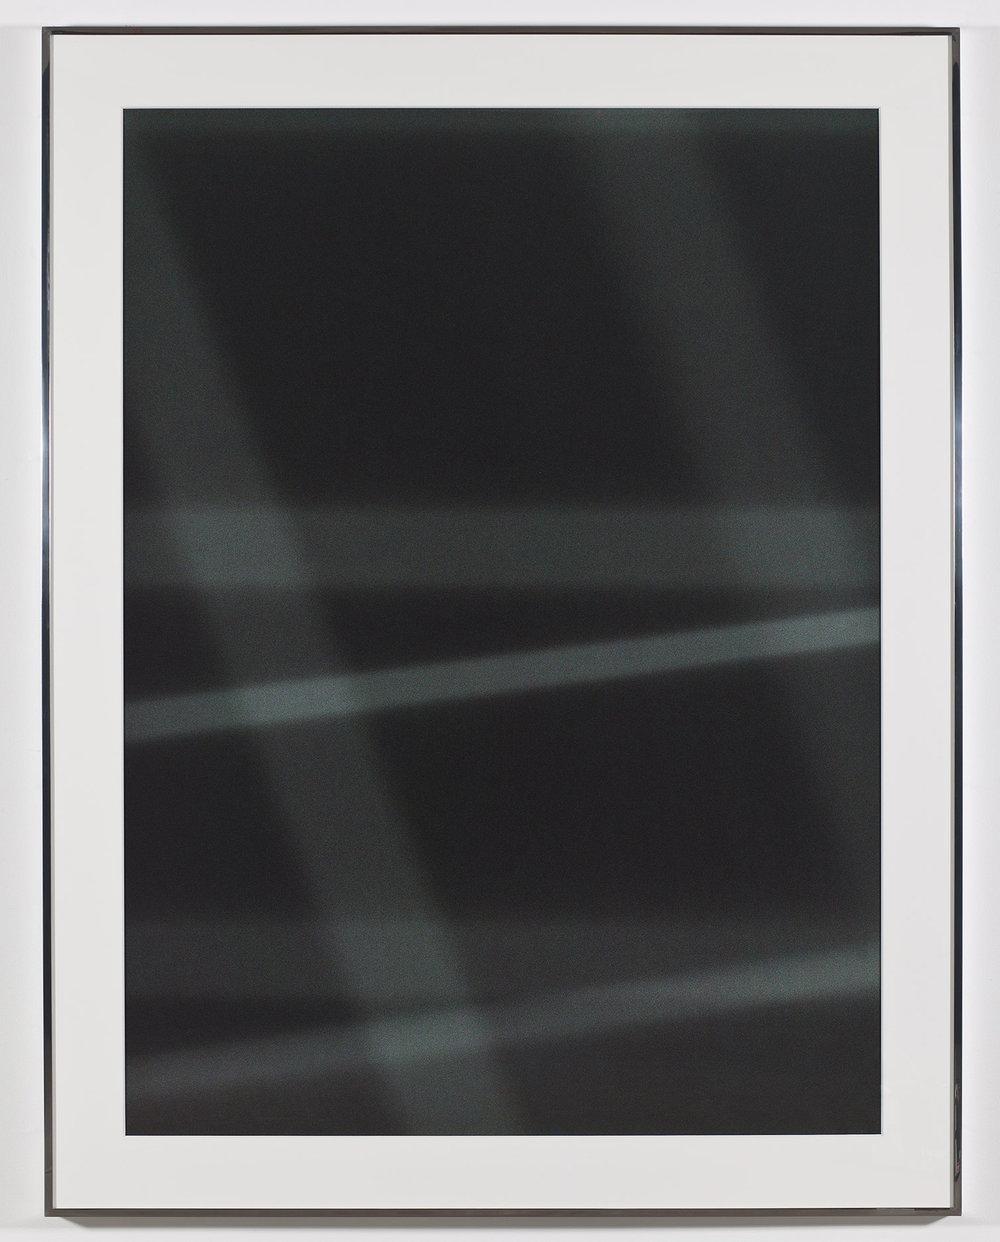 Transparency (Negative) [Kodak Portra 160NC Em. No. 3161: July 3–7, 2010 LAX/IAD/FRA/BLQ BLQ/BRU/ORD/LAX]   2011  Epson Ultrachrome K3 archival ink jet print on Museo Silver Rag Paper  68 x 52 1/4 inches   Transparencies, 2008–2014    Diapositives, 2011